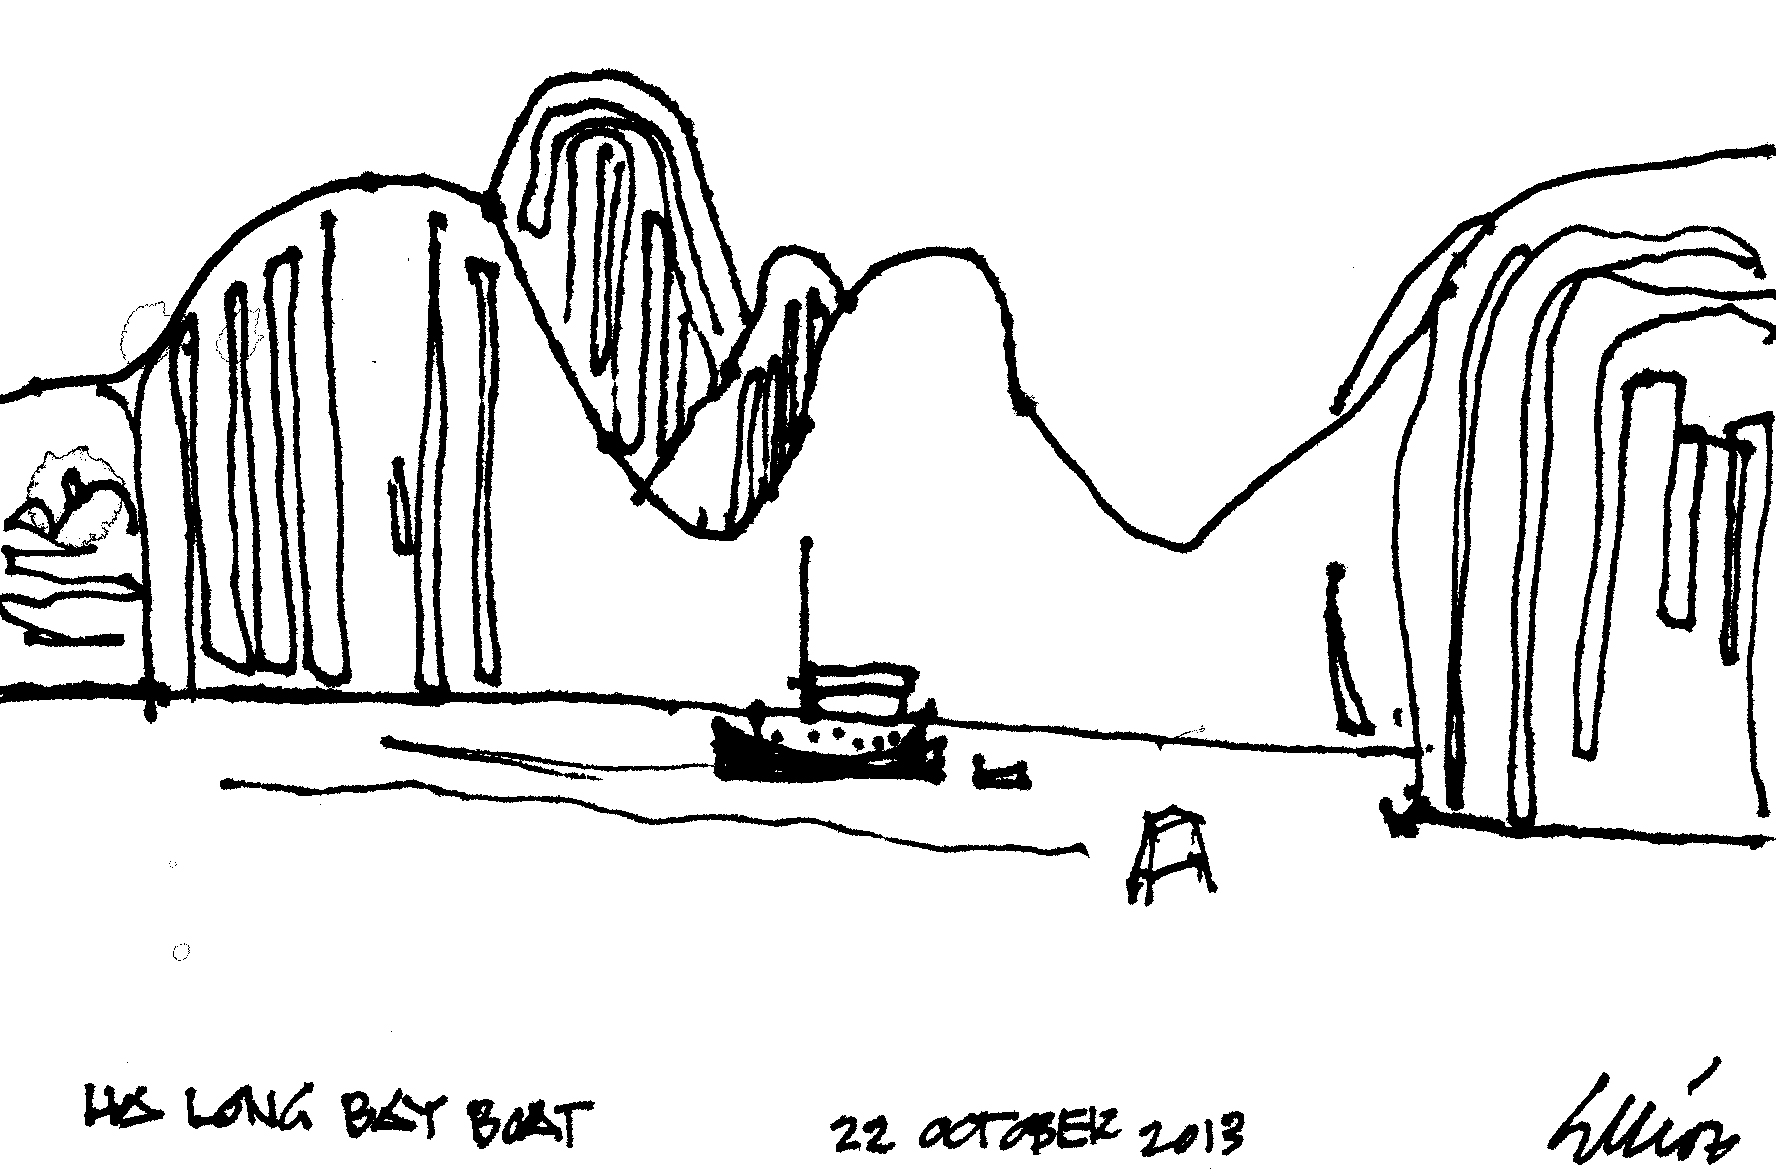 ha long bay boat 10.22.13